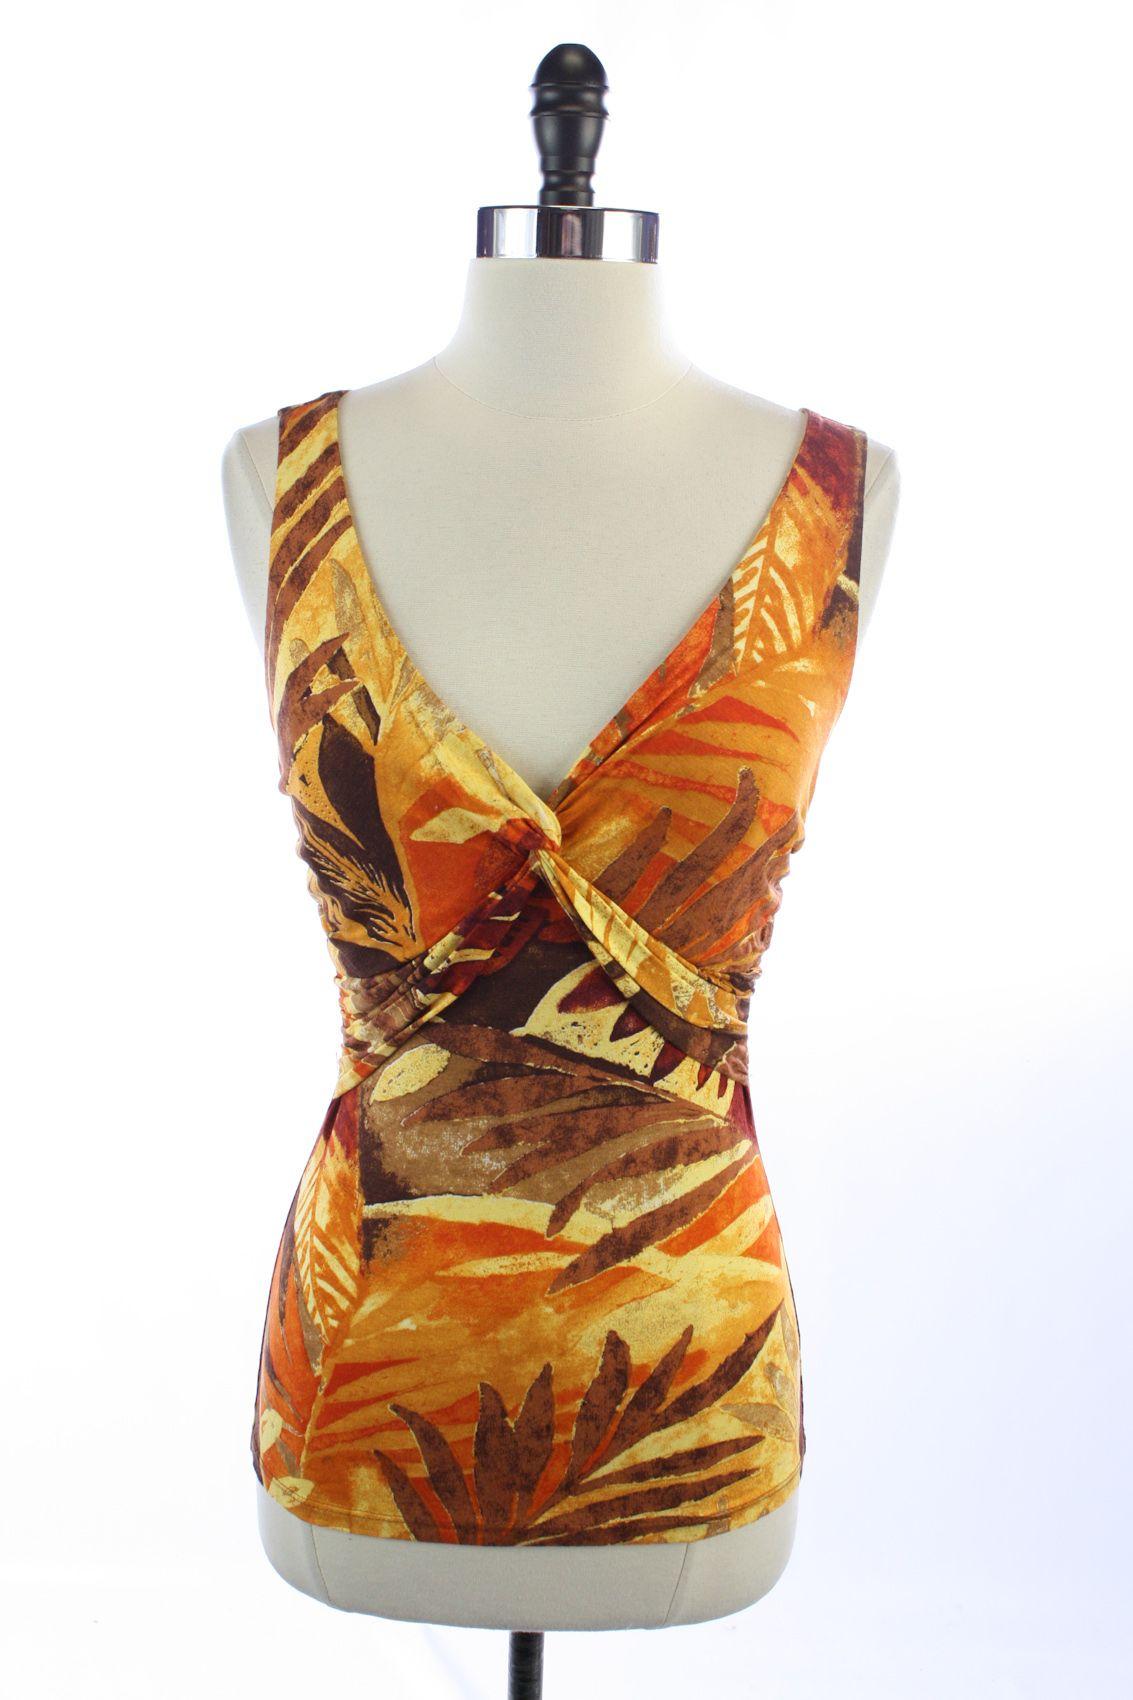 CACHE Orange Brown FLORAL Keyhole V-NECK Sleeveless TOP Shirt BLOUSE S